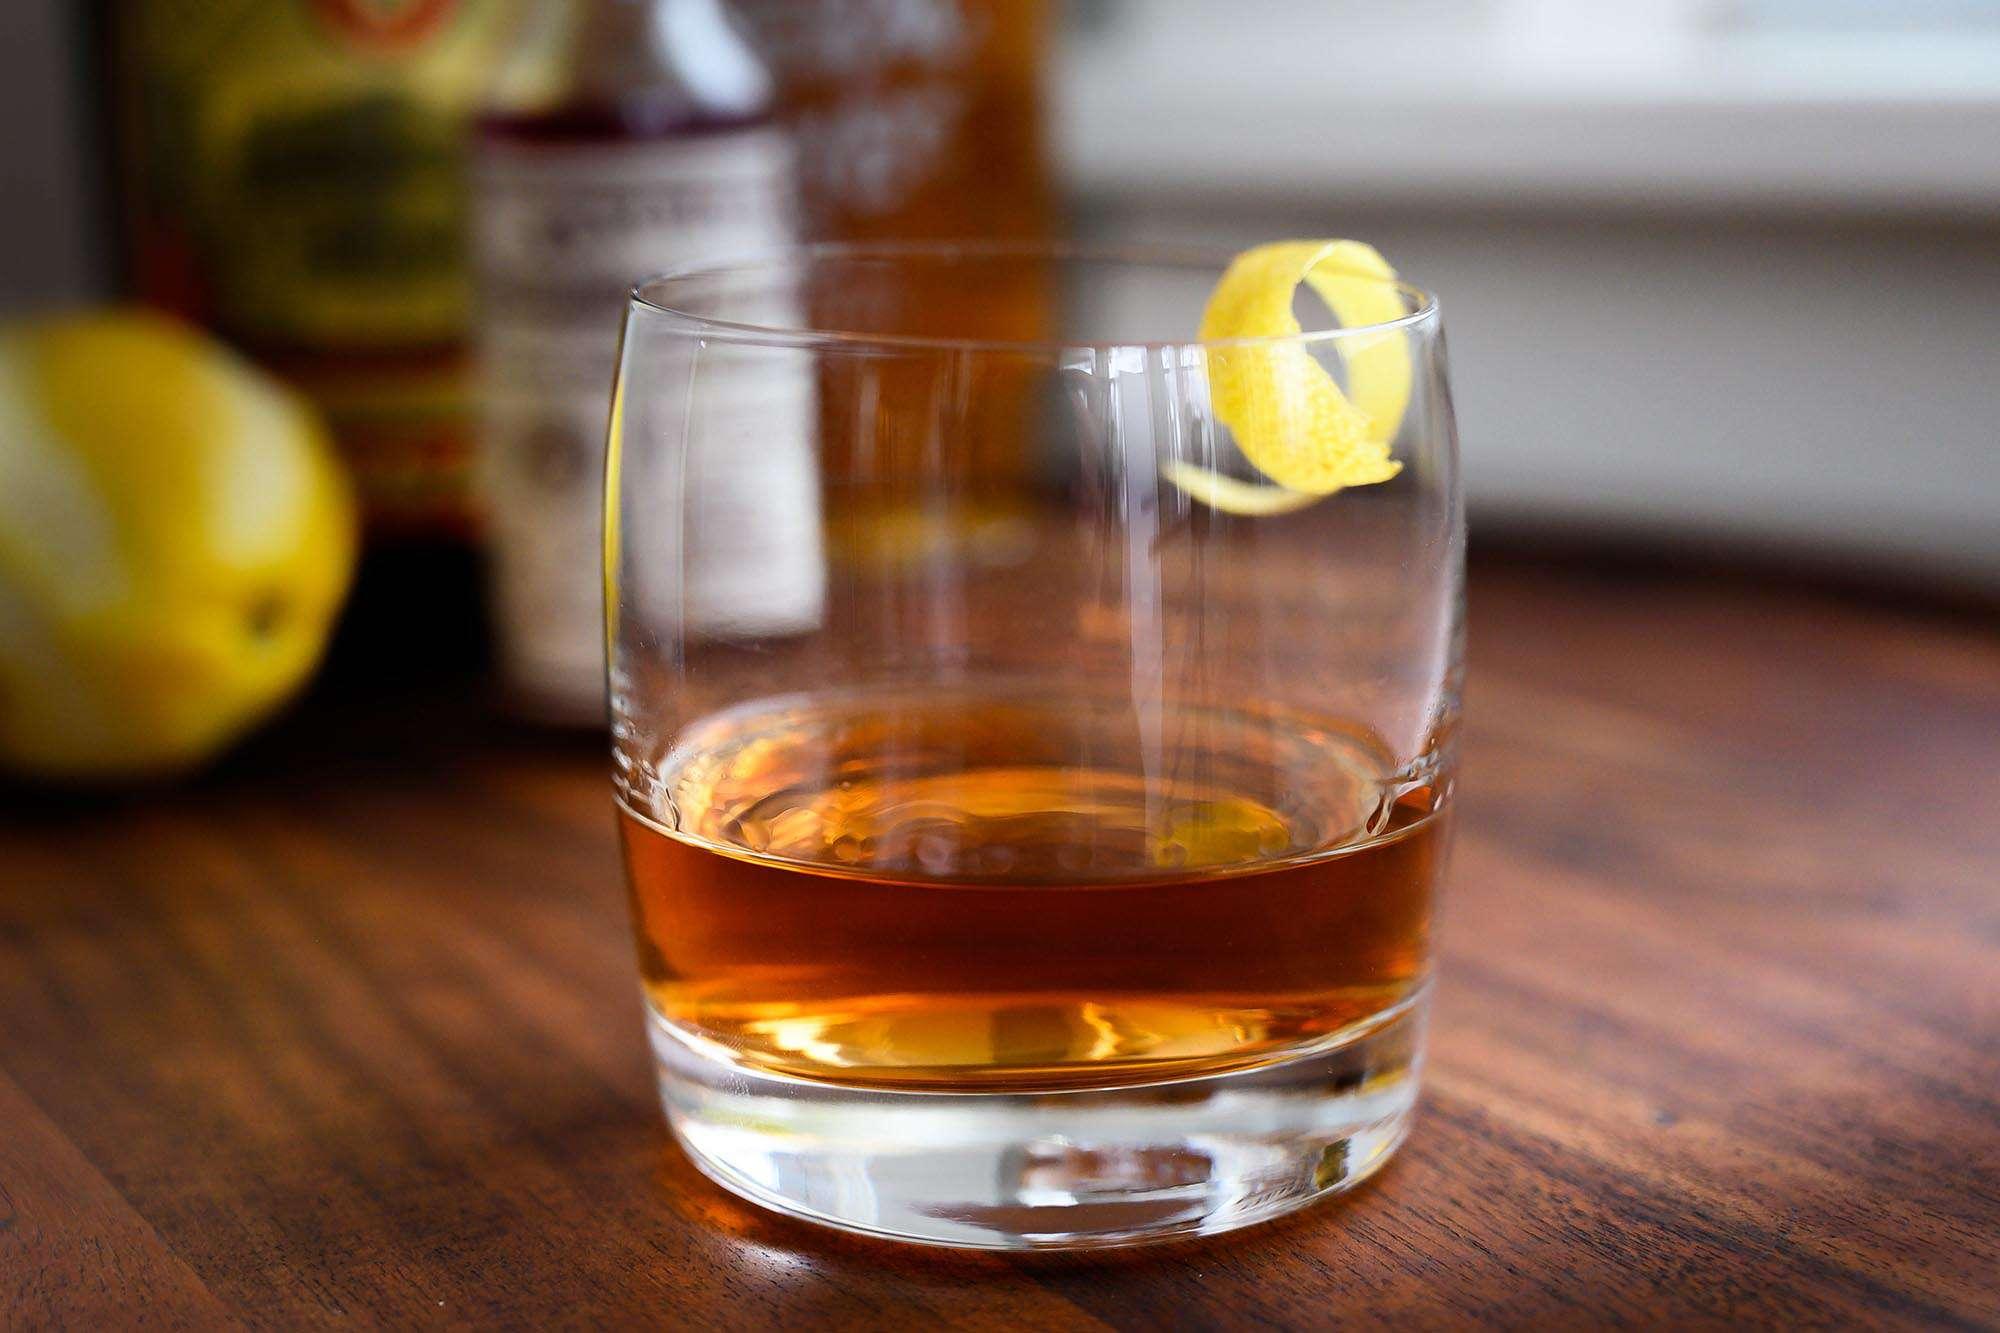 Close up horizontal view of sazarec drink. Sazarec ingredients are in the background.